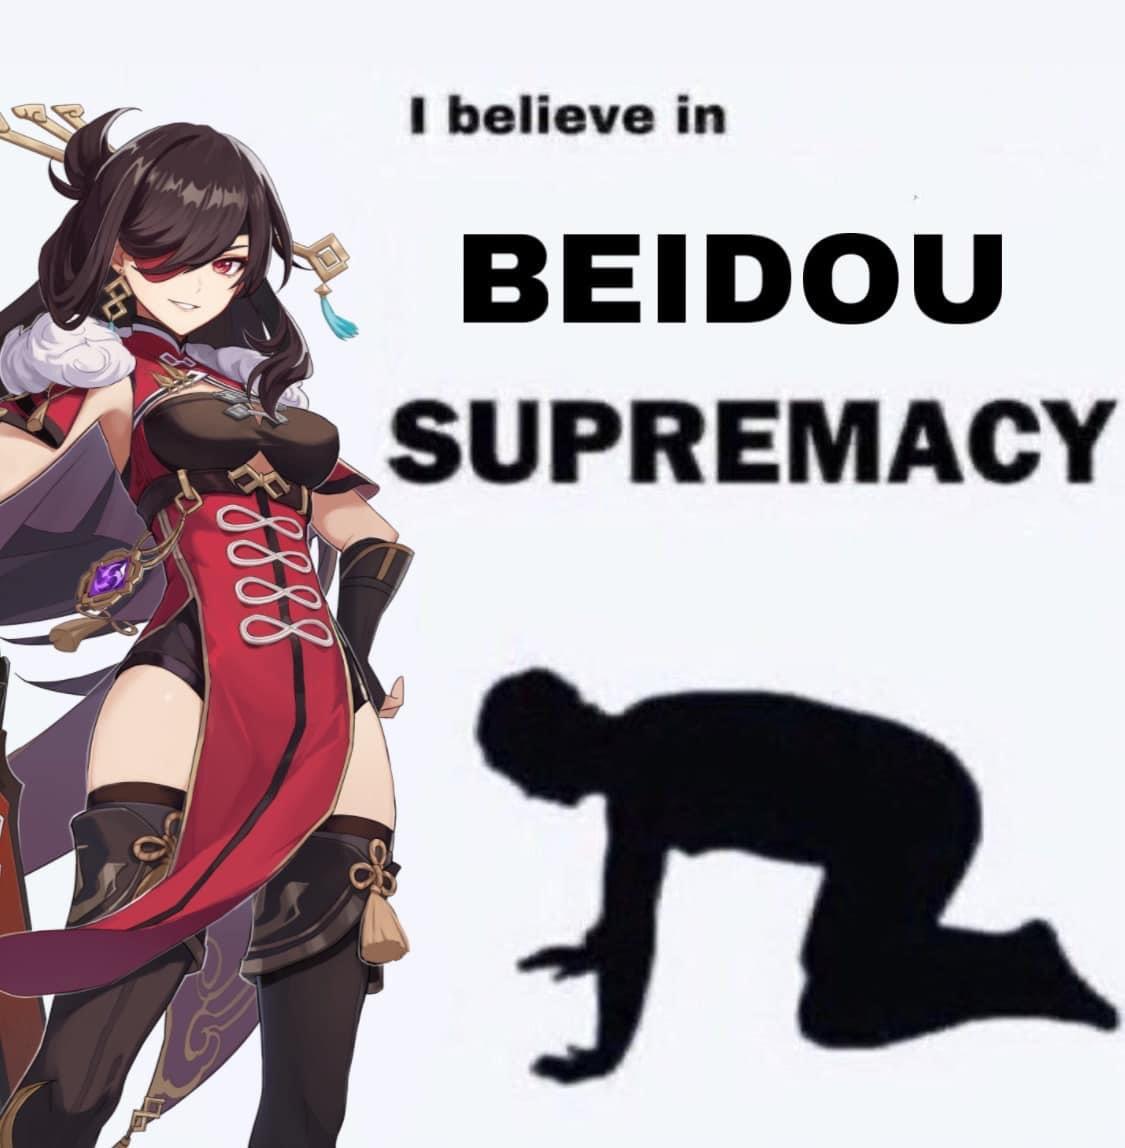 I believe in Beidou supremacy meme